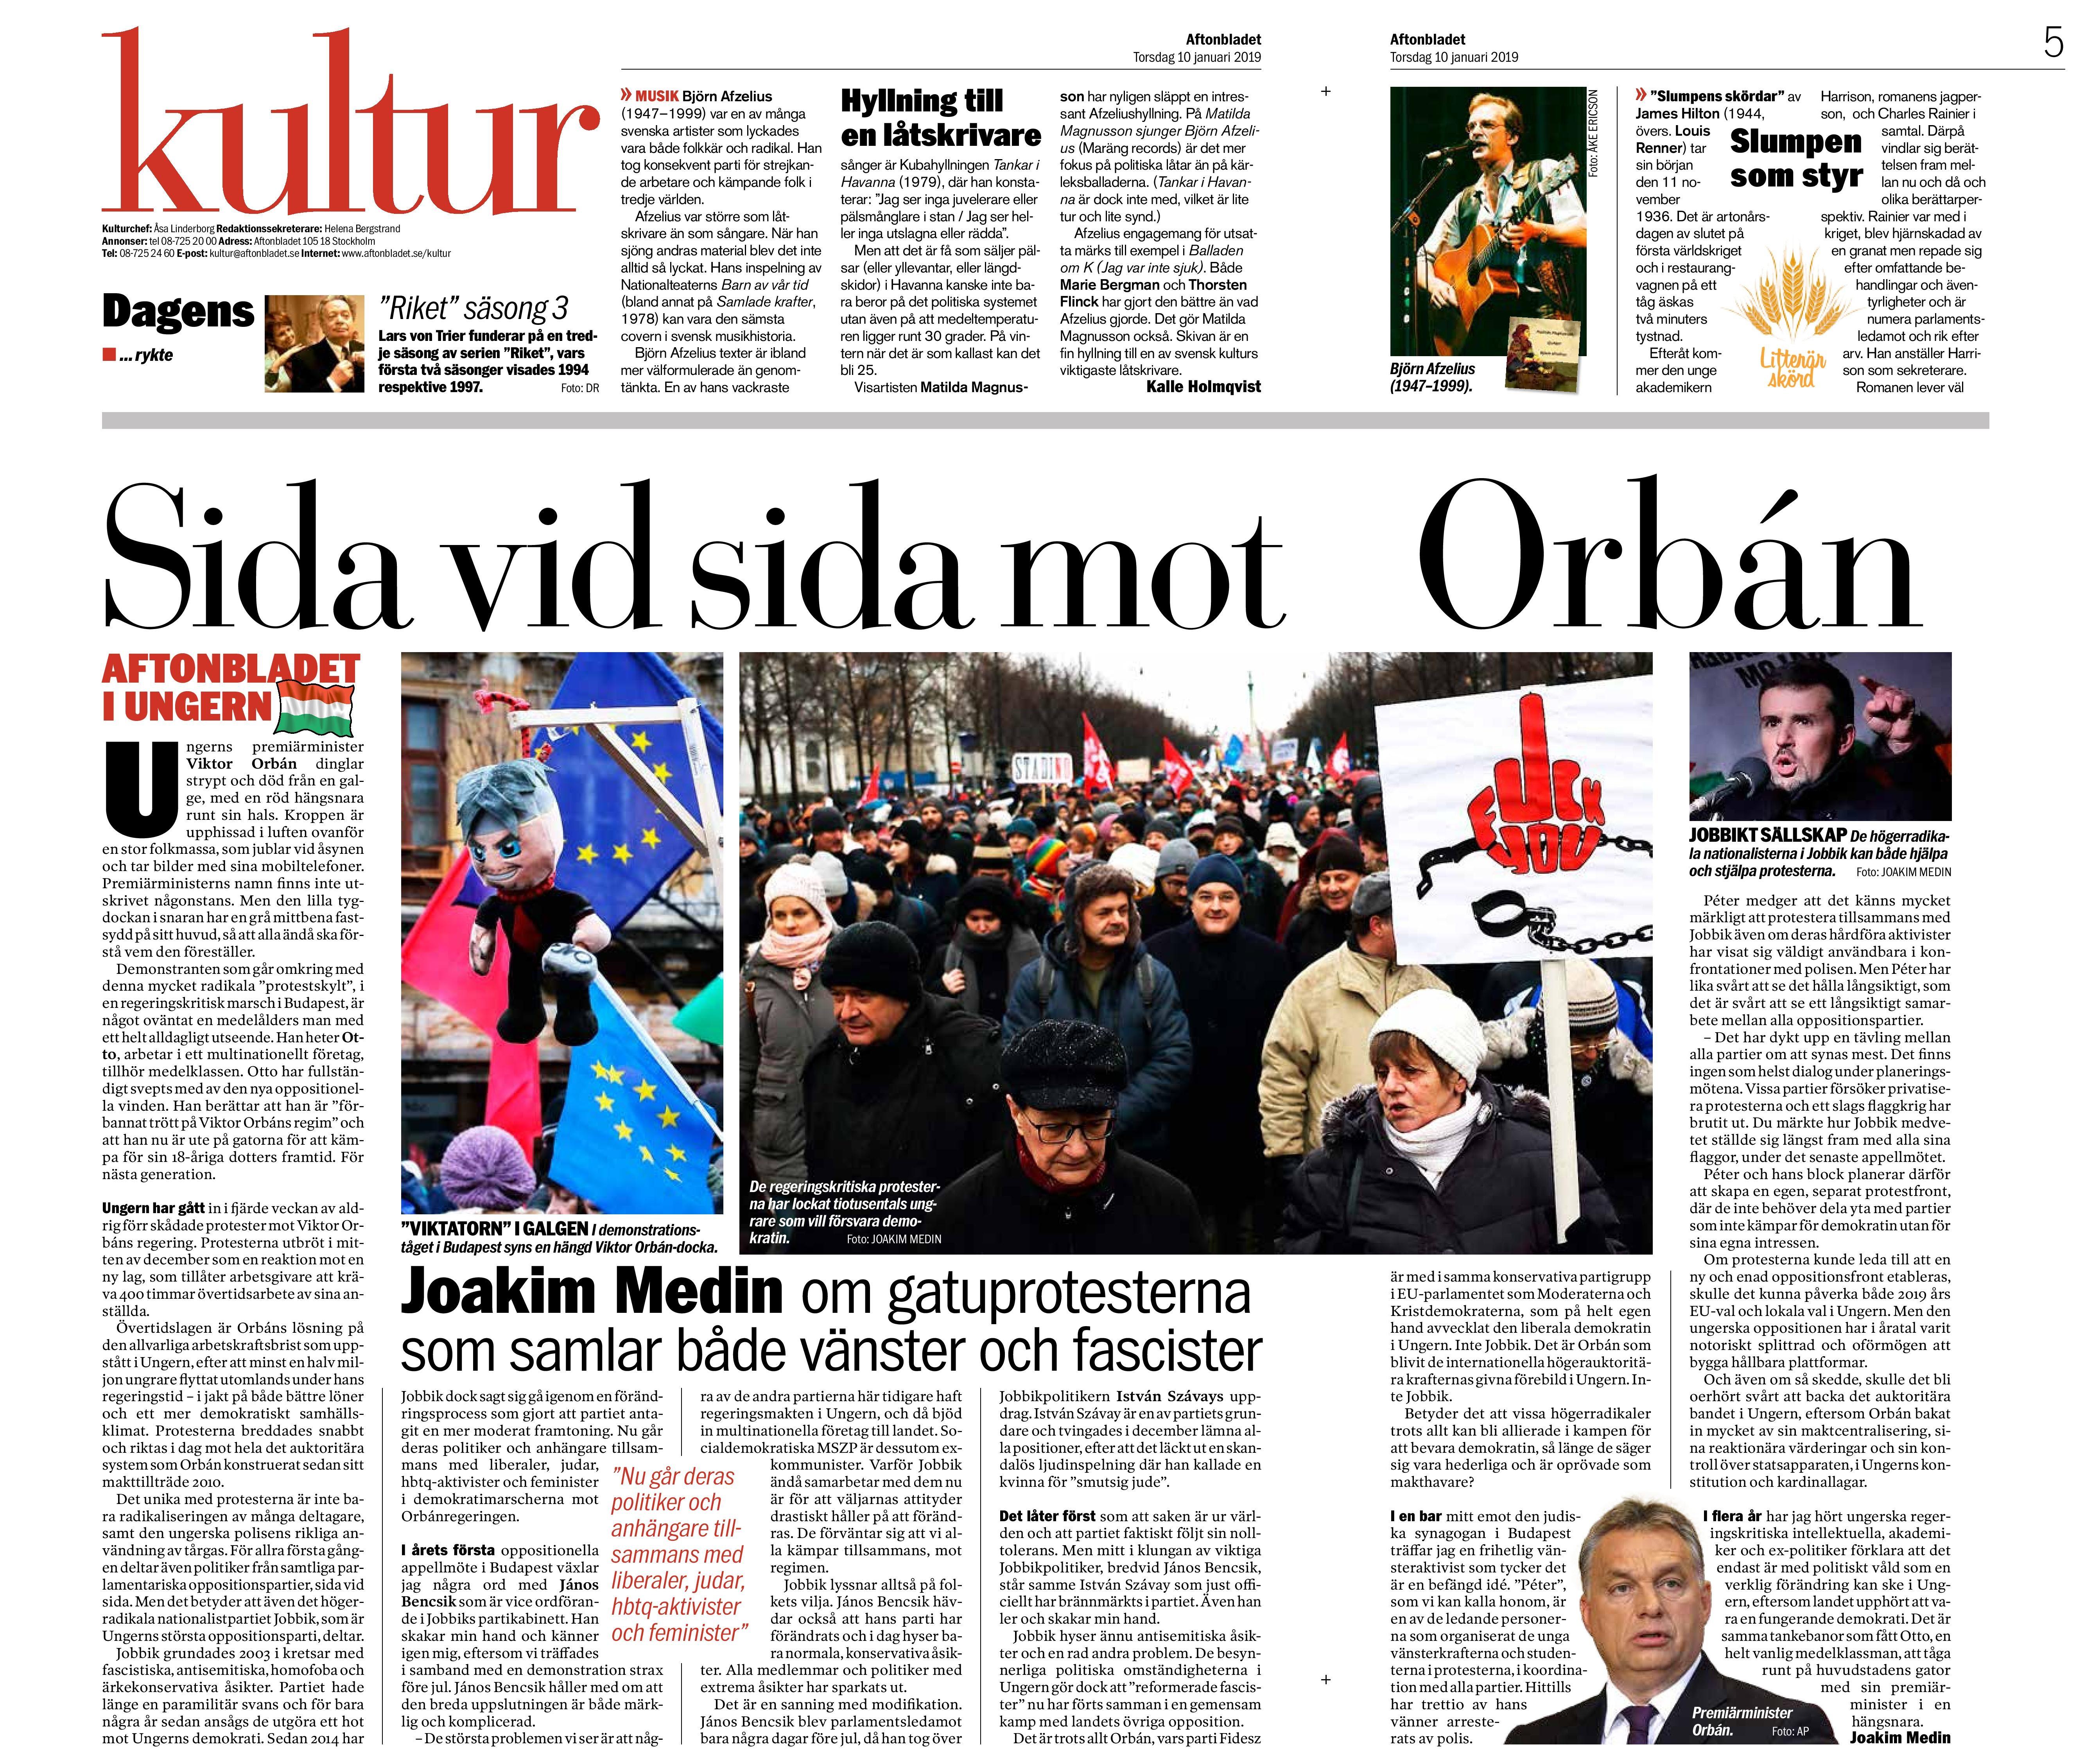 Ungern, Aftonbladet 20190110